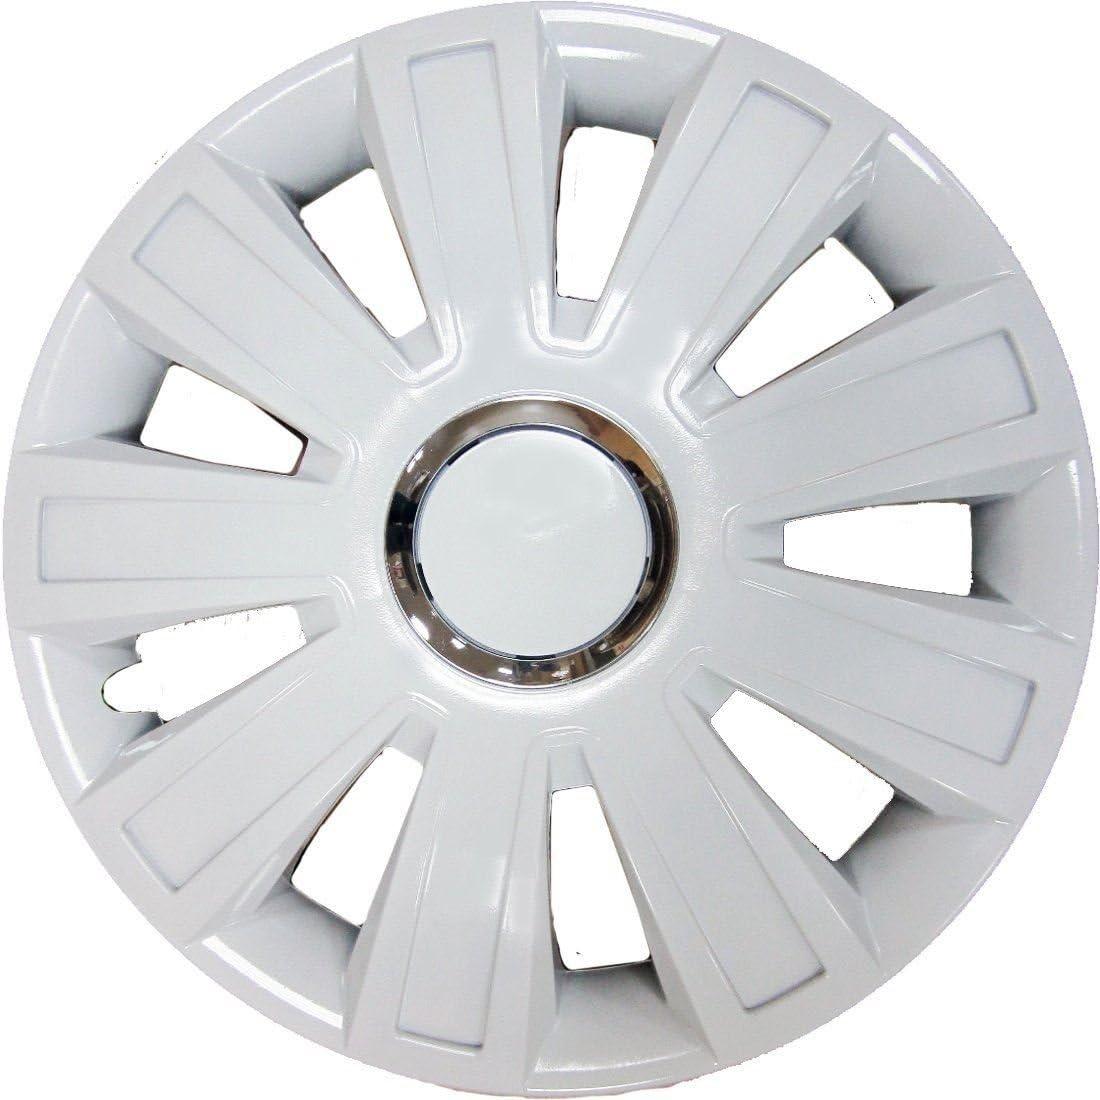 UKB4C 4x White Wheel Trims Hub Caps 15 Covers fits Ford Vauxhall Astra H Corsa D